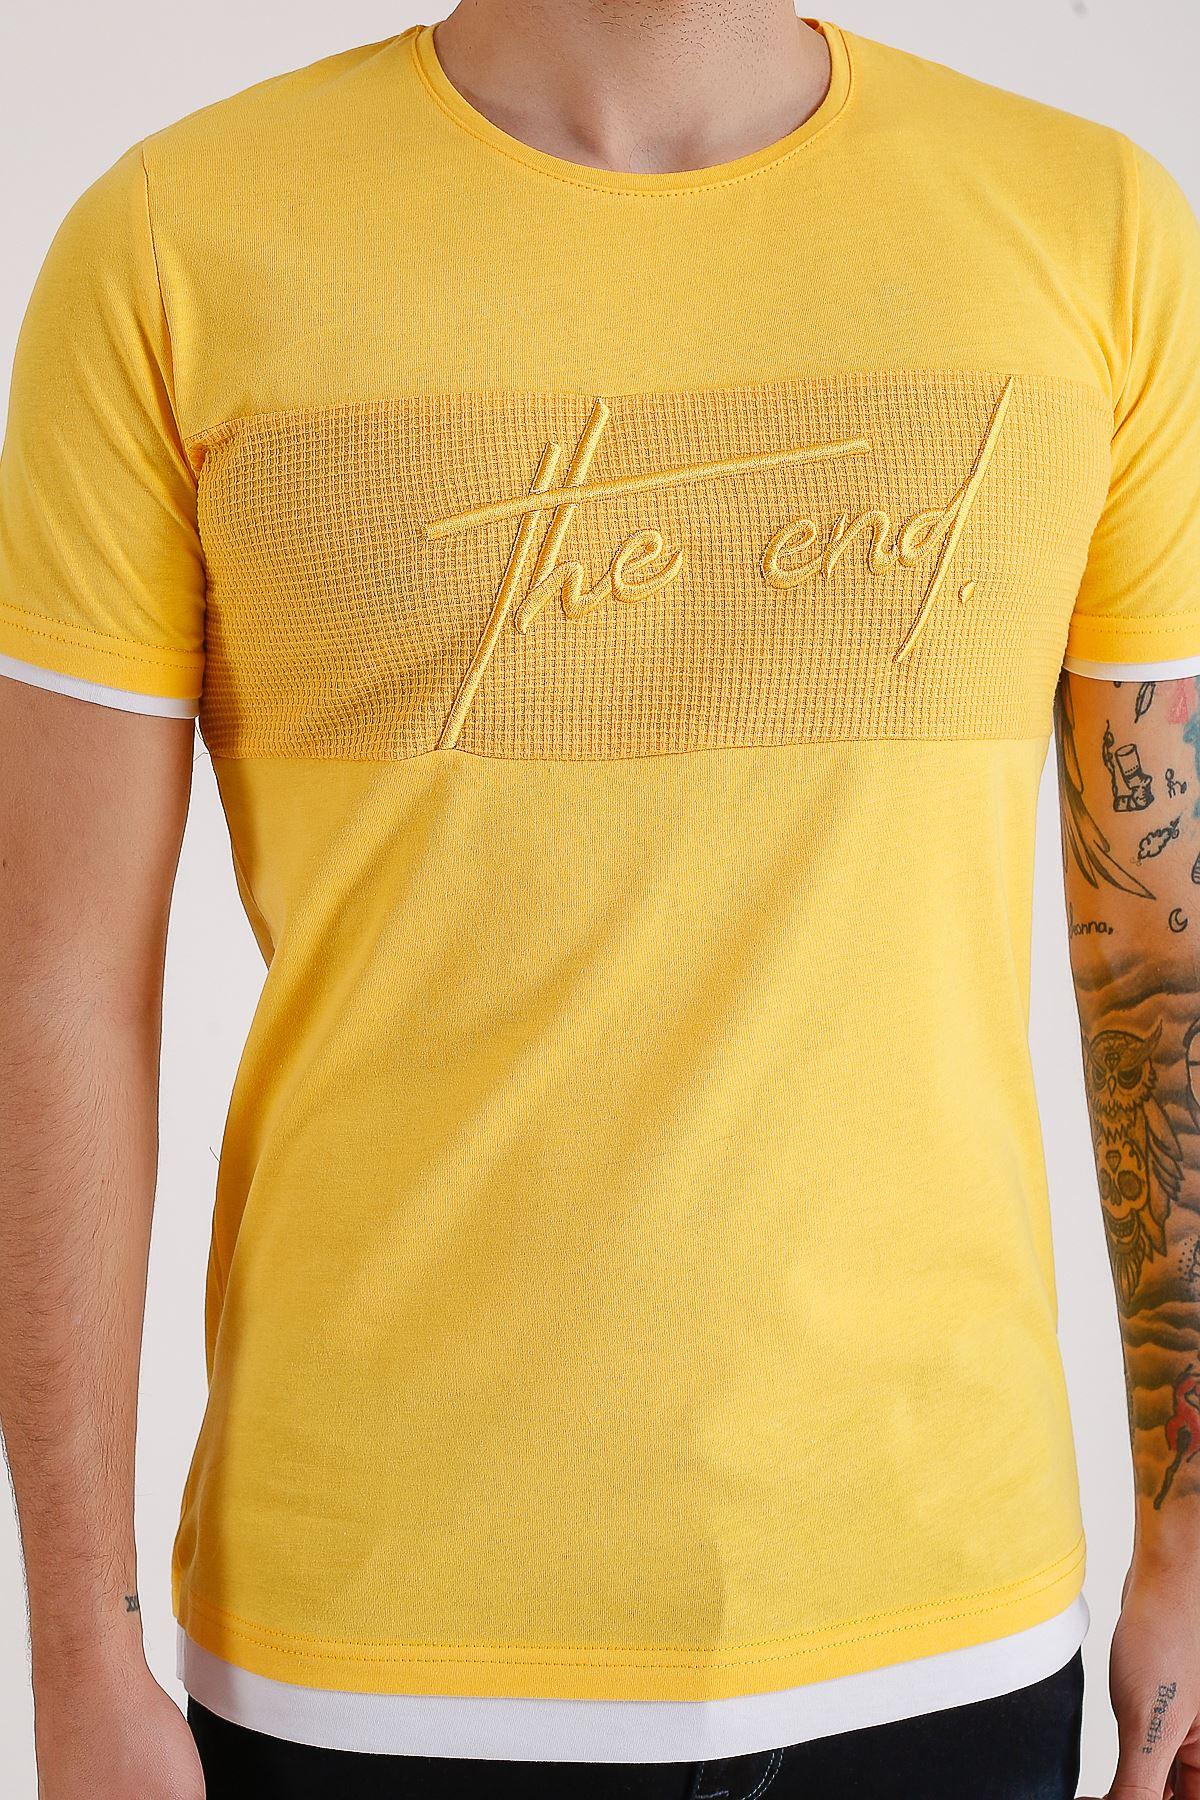 Bisiklet Yaka Nakışlı Sarı Erkek Penye T-Shirt